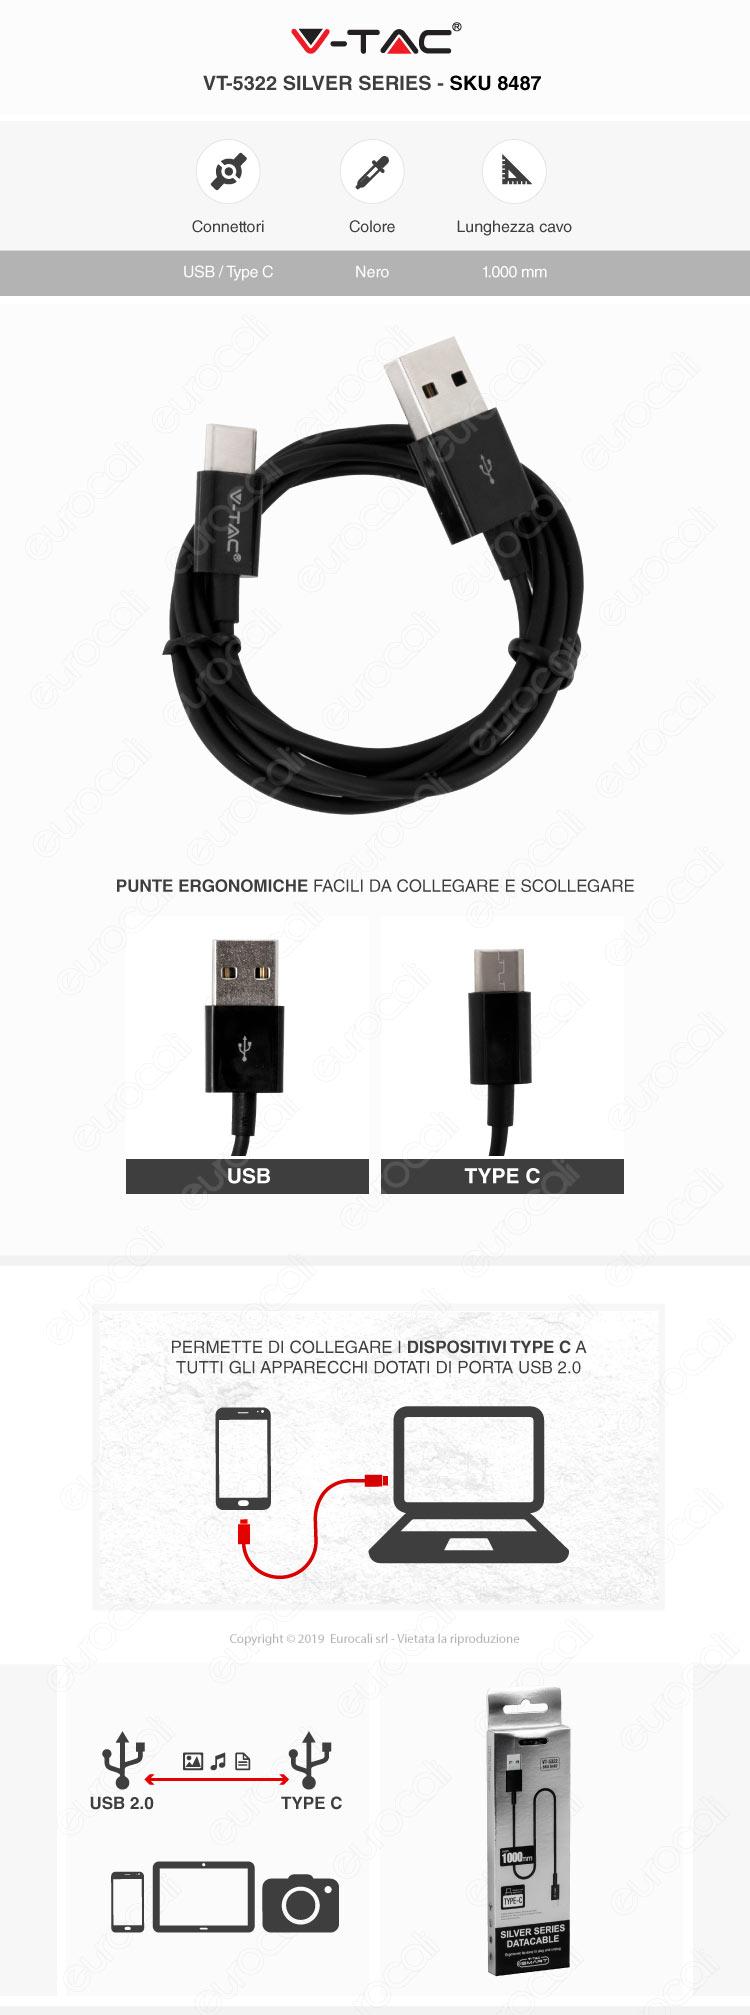 V-Tac VT-5322 Silver series USB Data Cable Type-C Cavo Colore Nero 1m